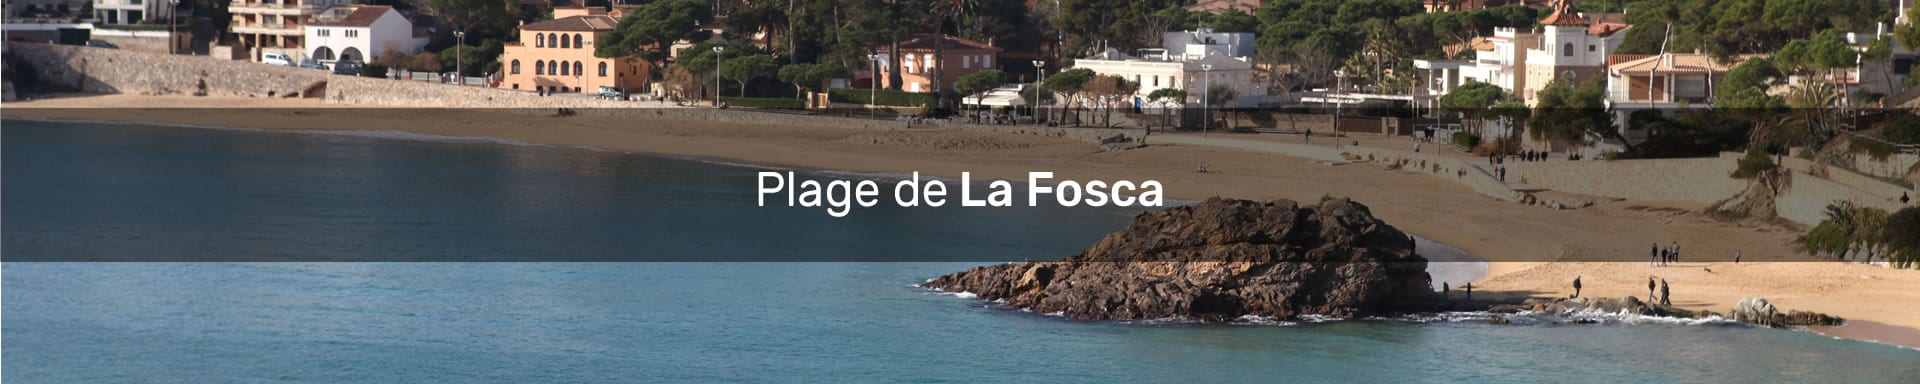 banner-la-platja-fr